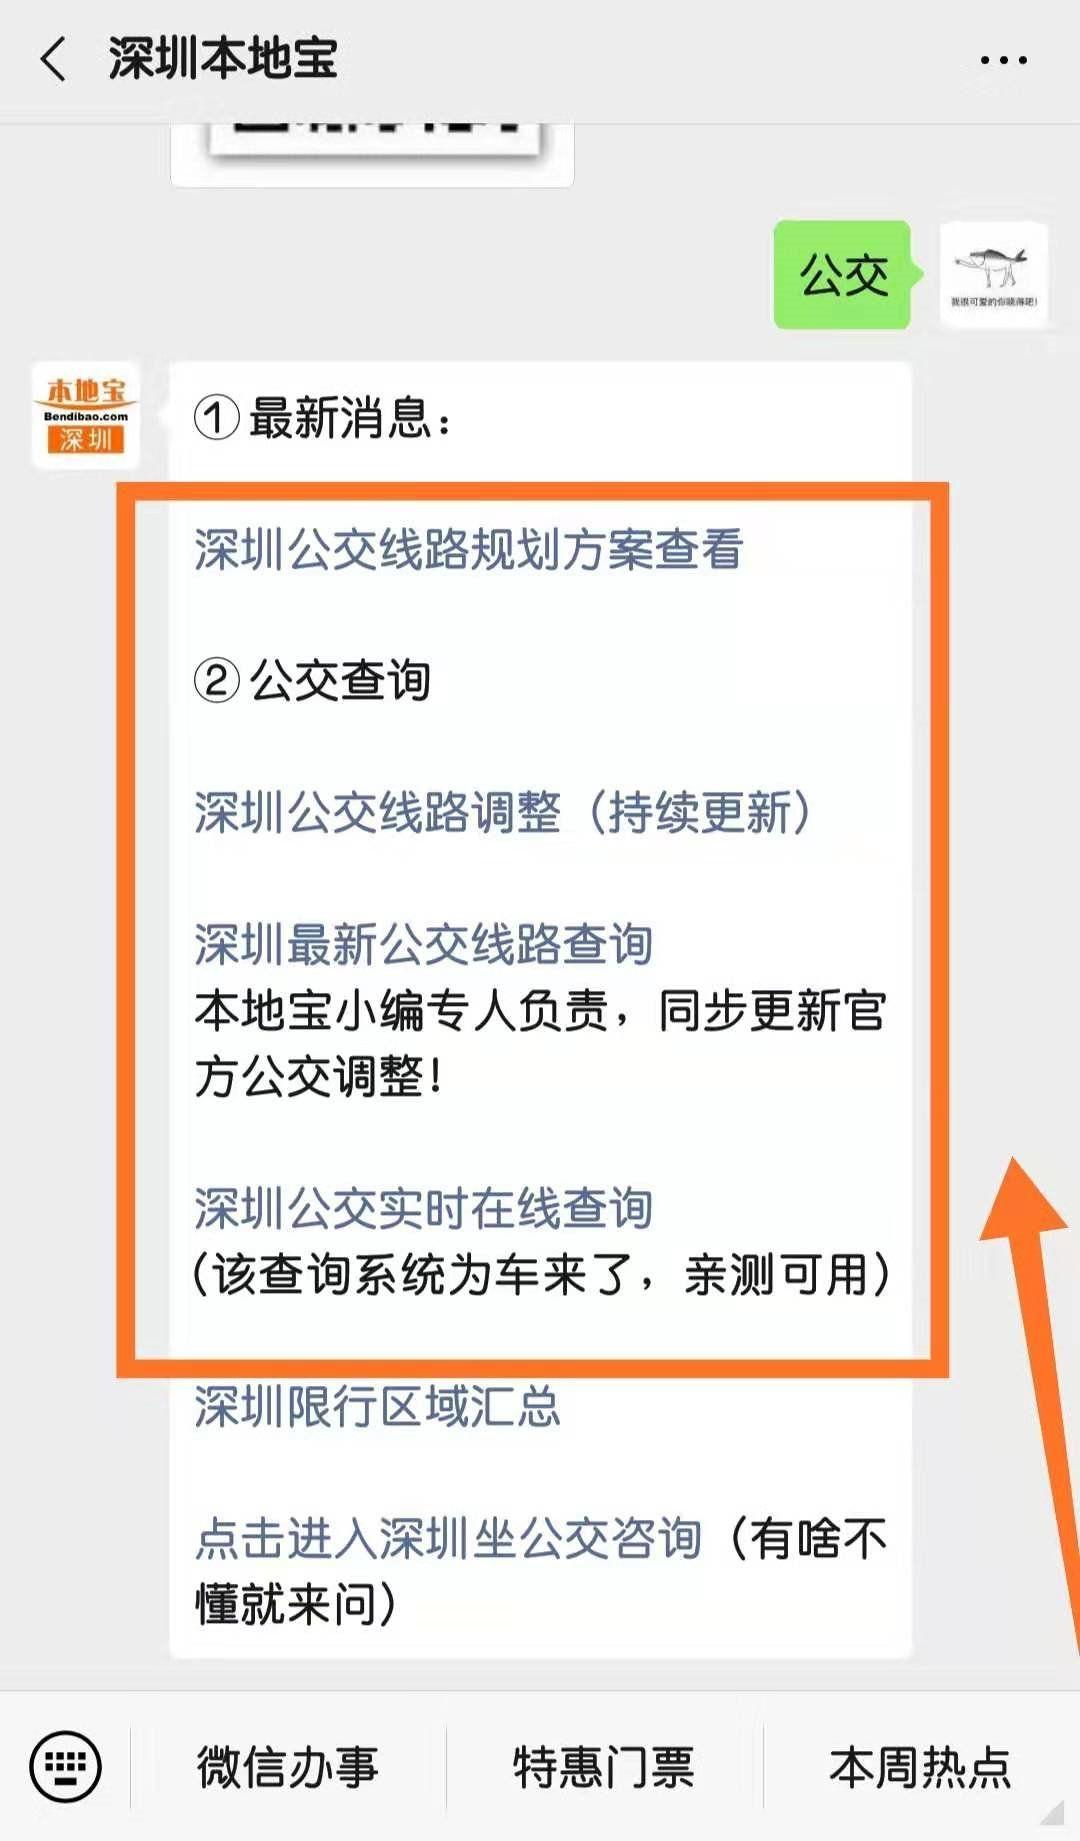 http://www.szminfu.com/shenzhenlvyou/33044.html